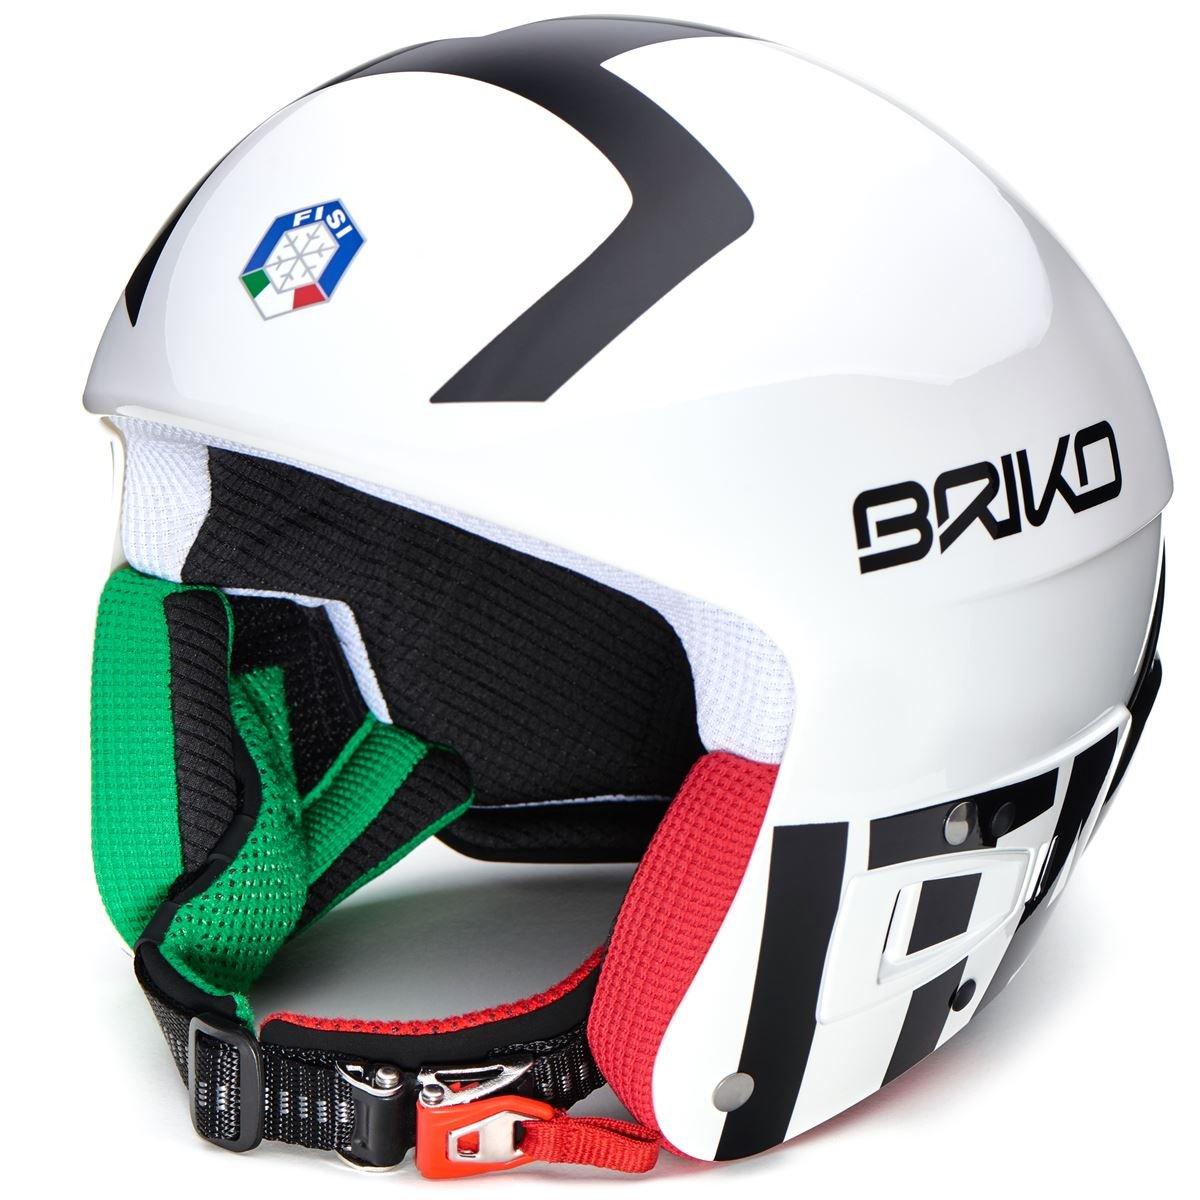 Fisi Briko Vulcano Fis 6.8 Junior